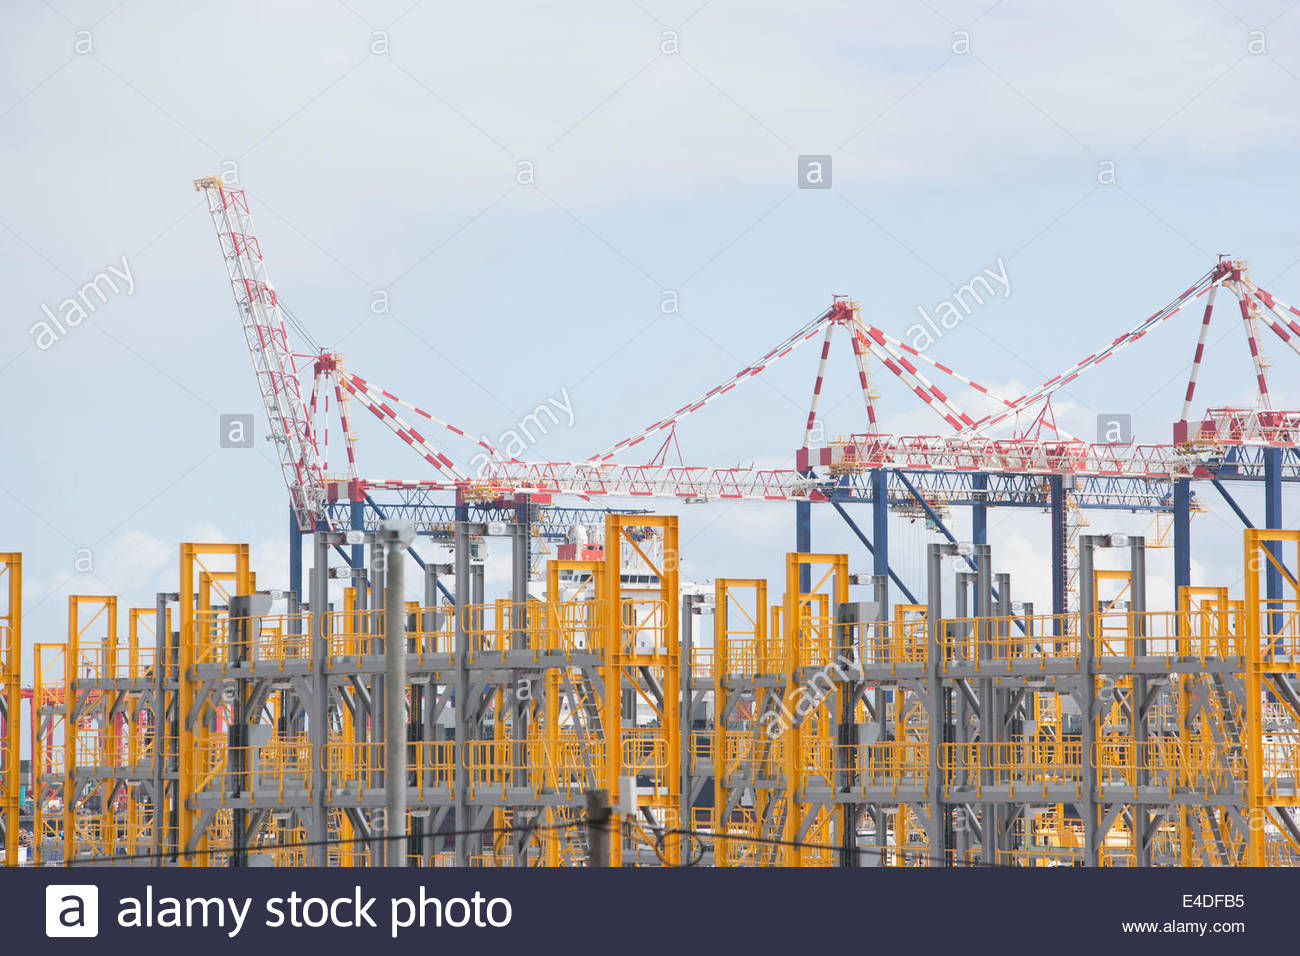 Cargo cranes in dockyard - Stock Image